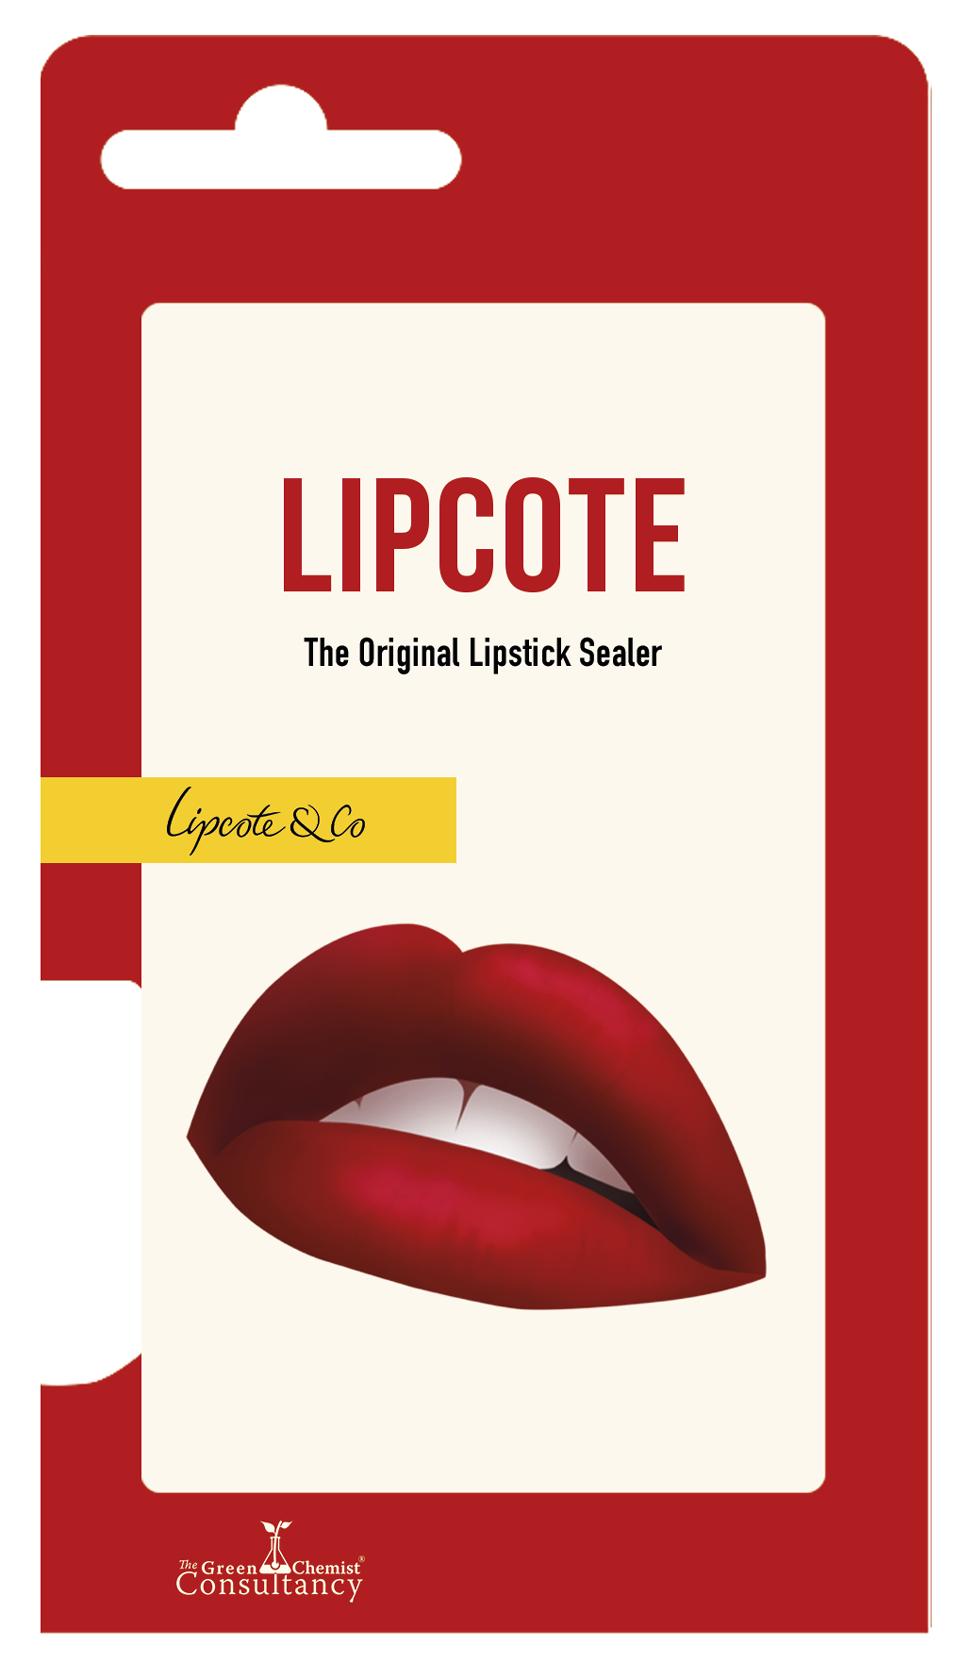 LipcoteBox3.png